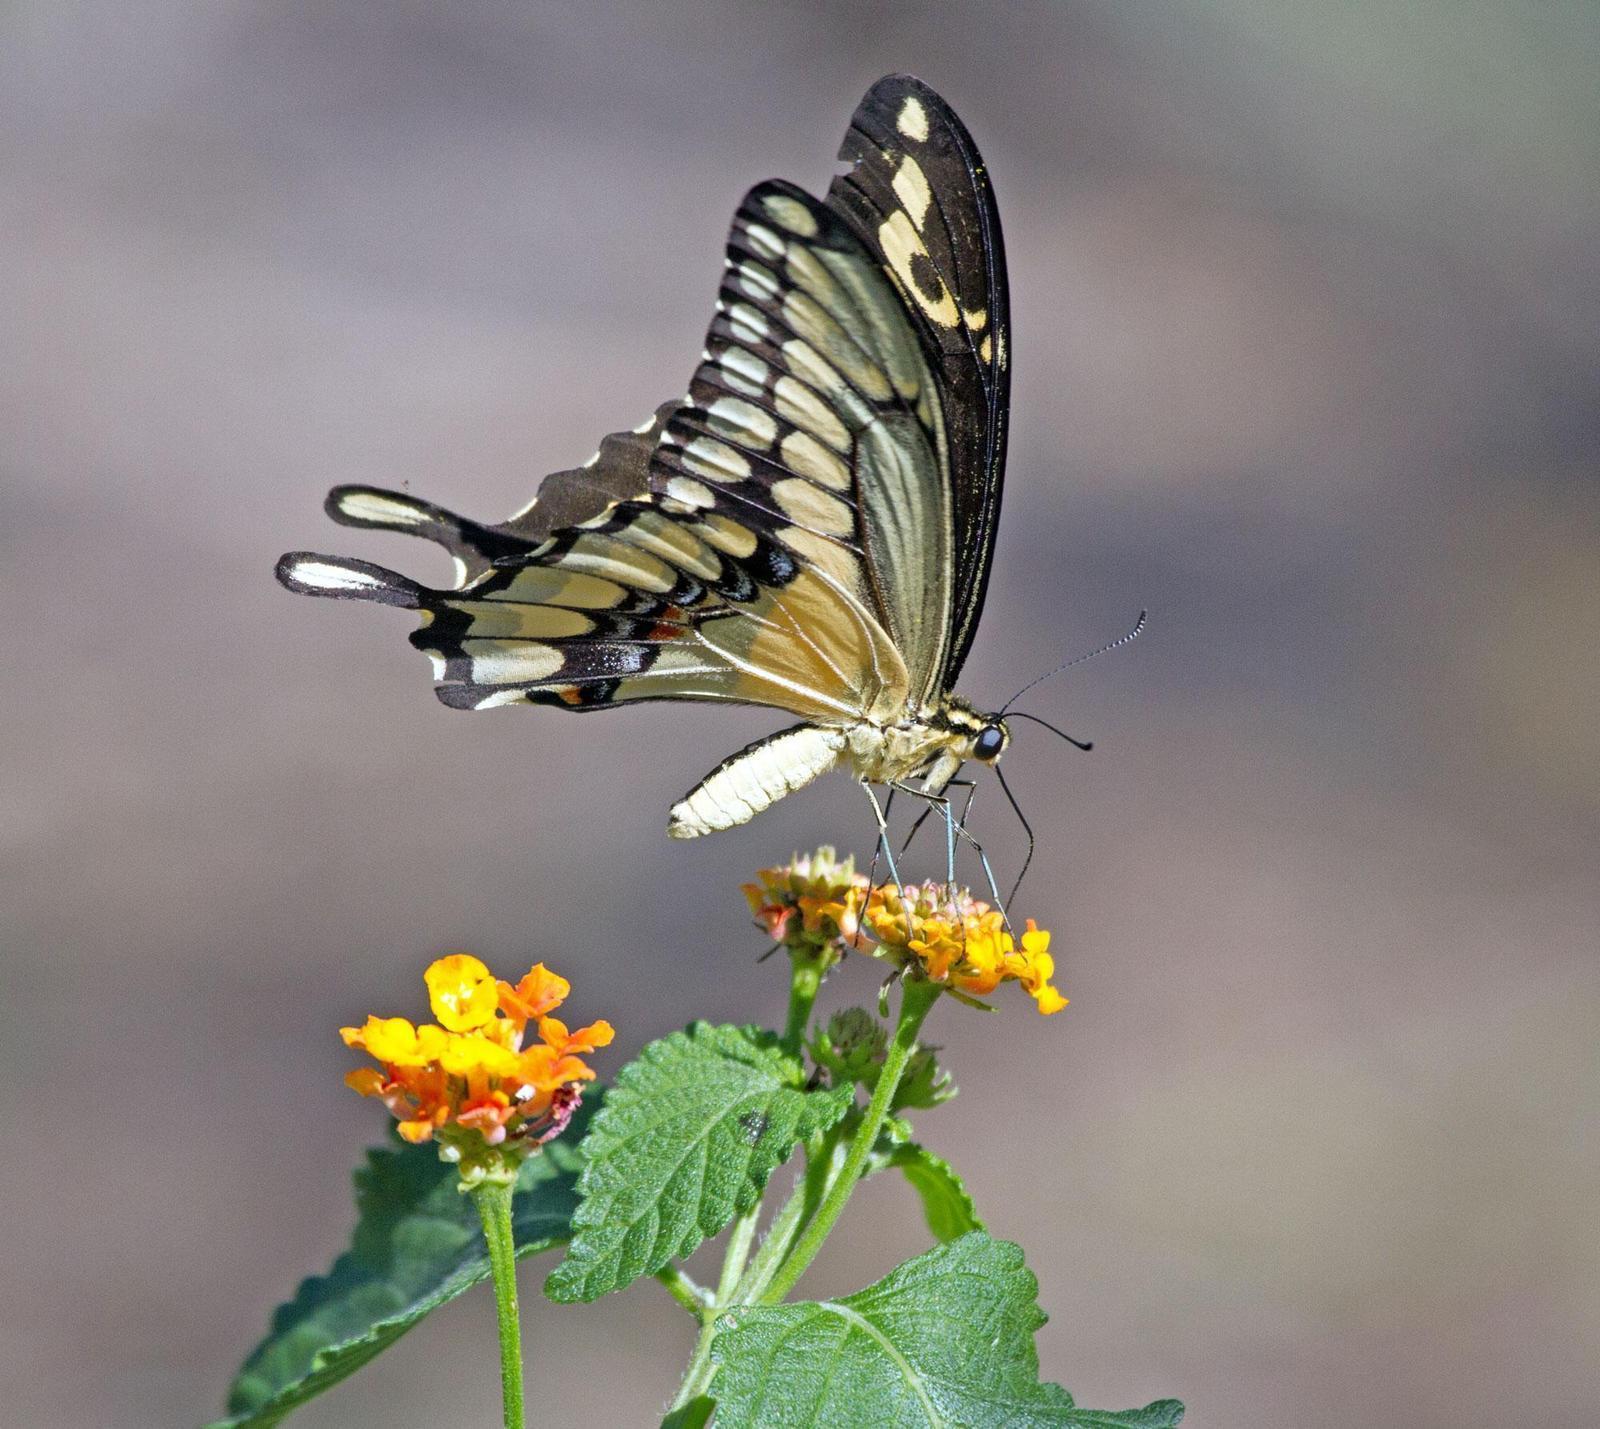 Giant Swallowtail Photo by Scott Berglund